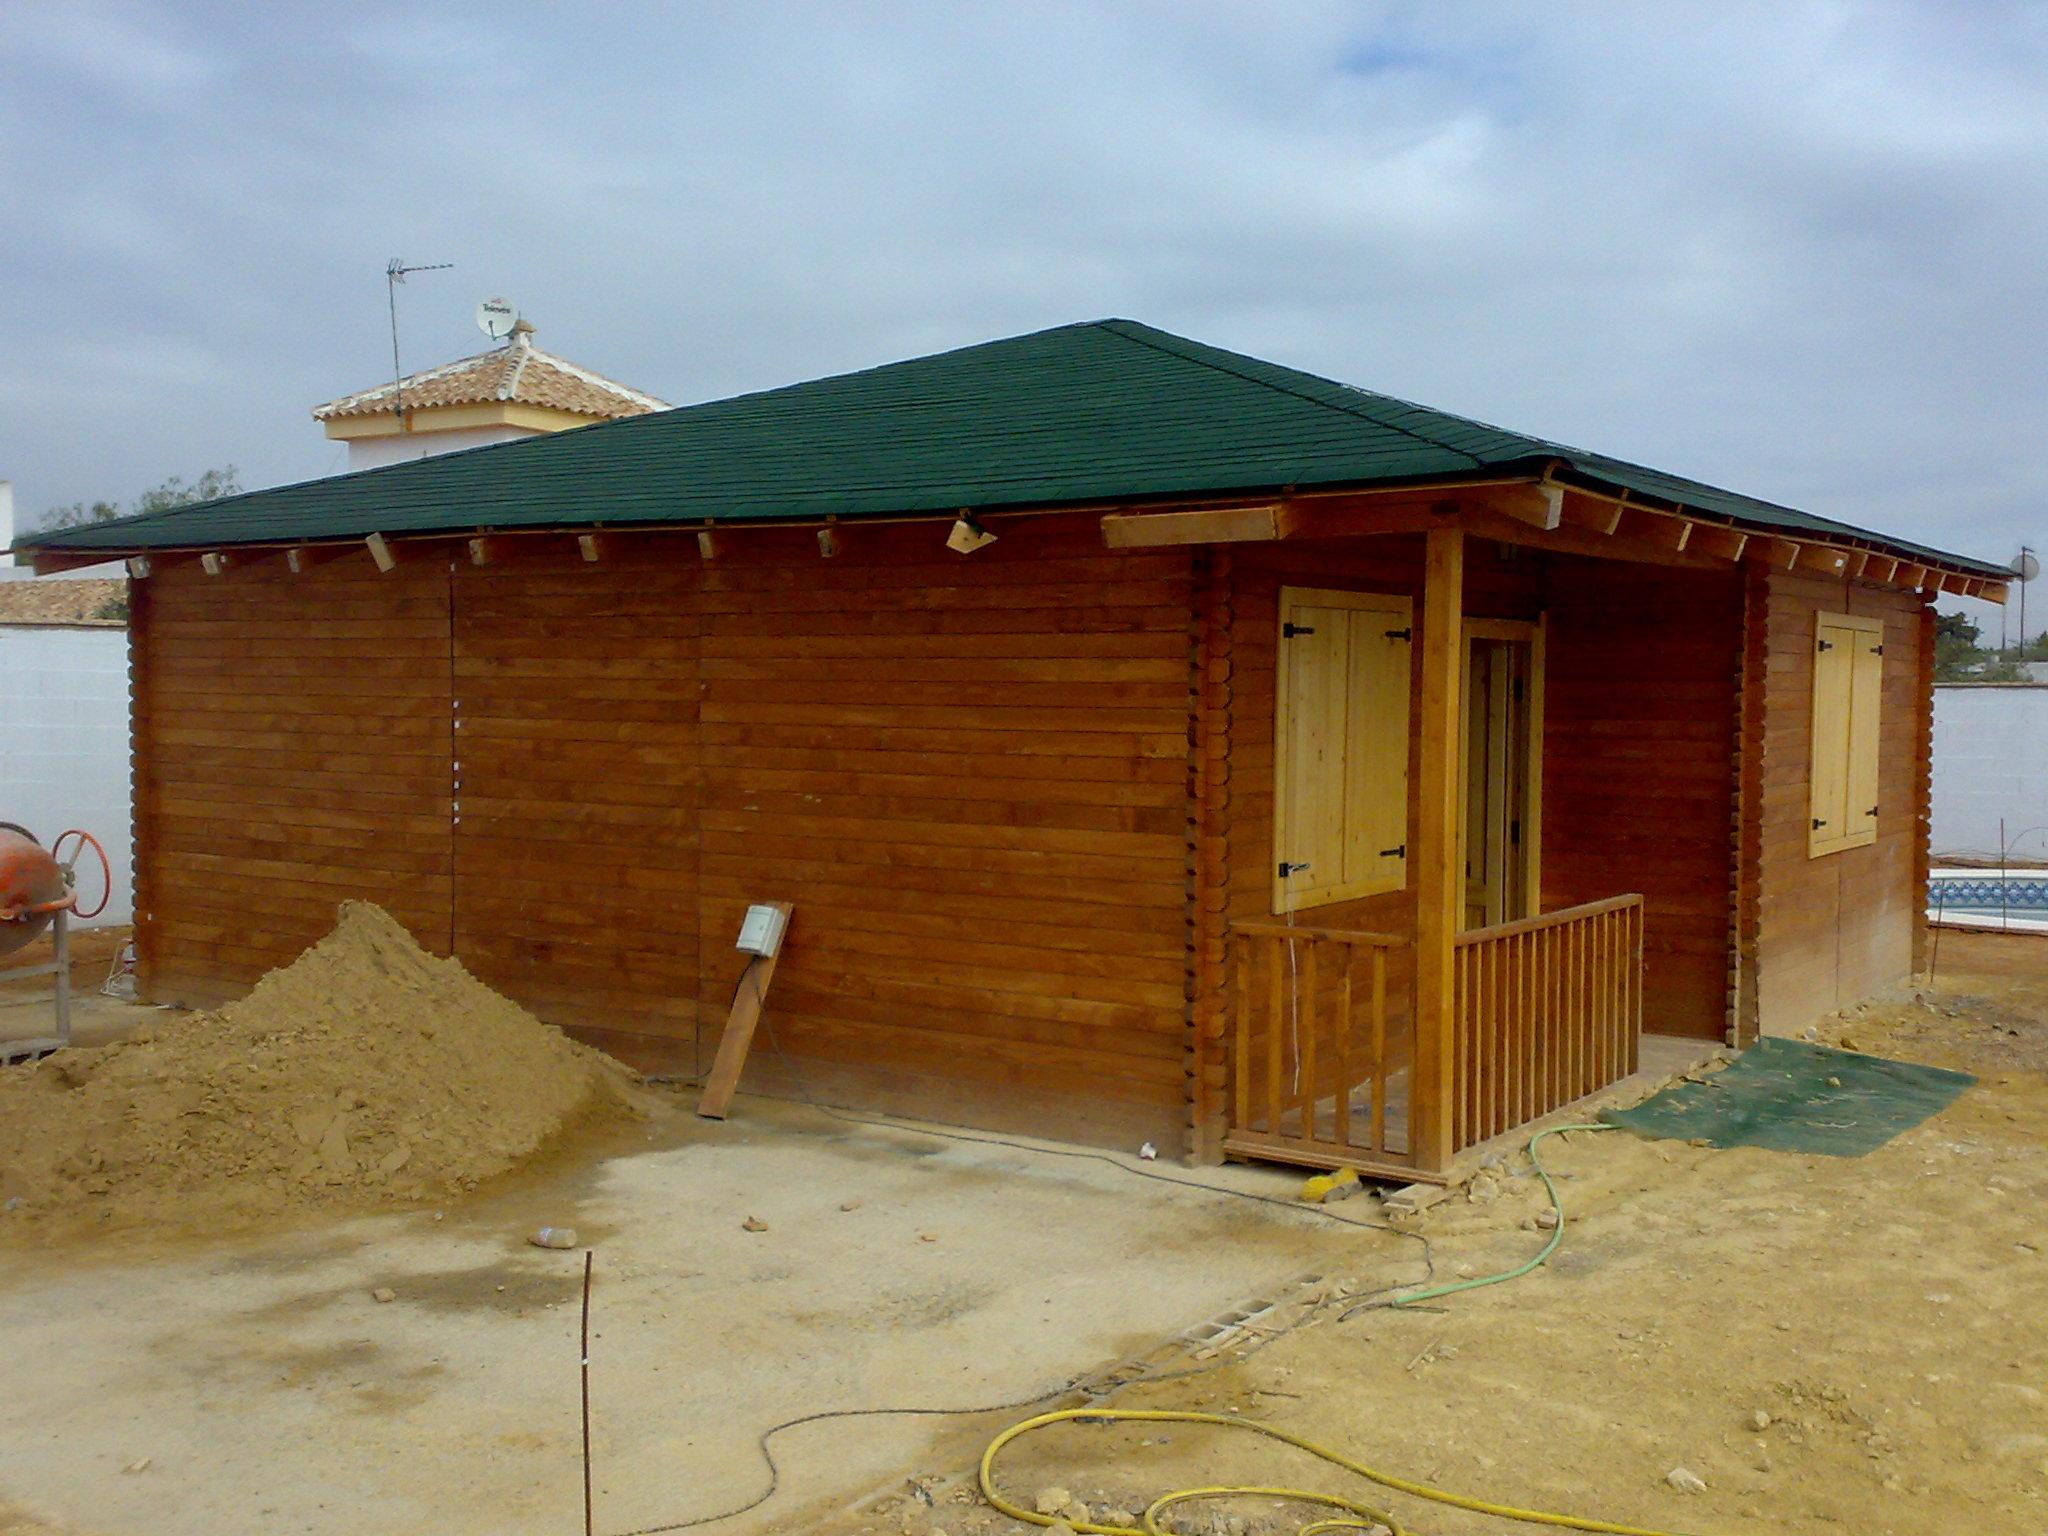 Casa de madera sevilla nueva a estrenar de 60 m2 con - Casa madera sevilla ...